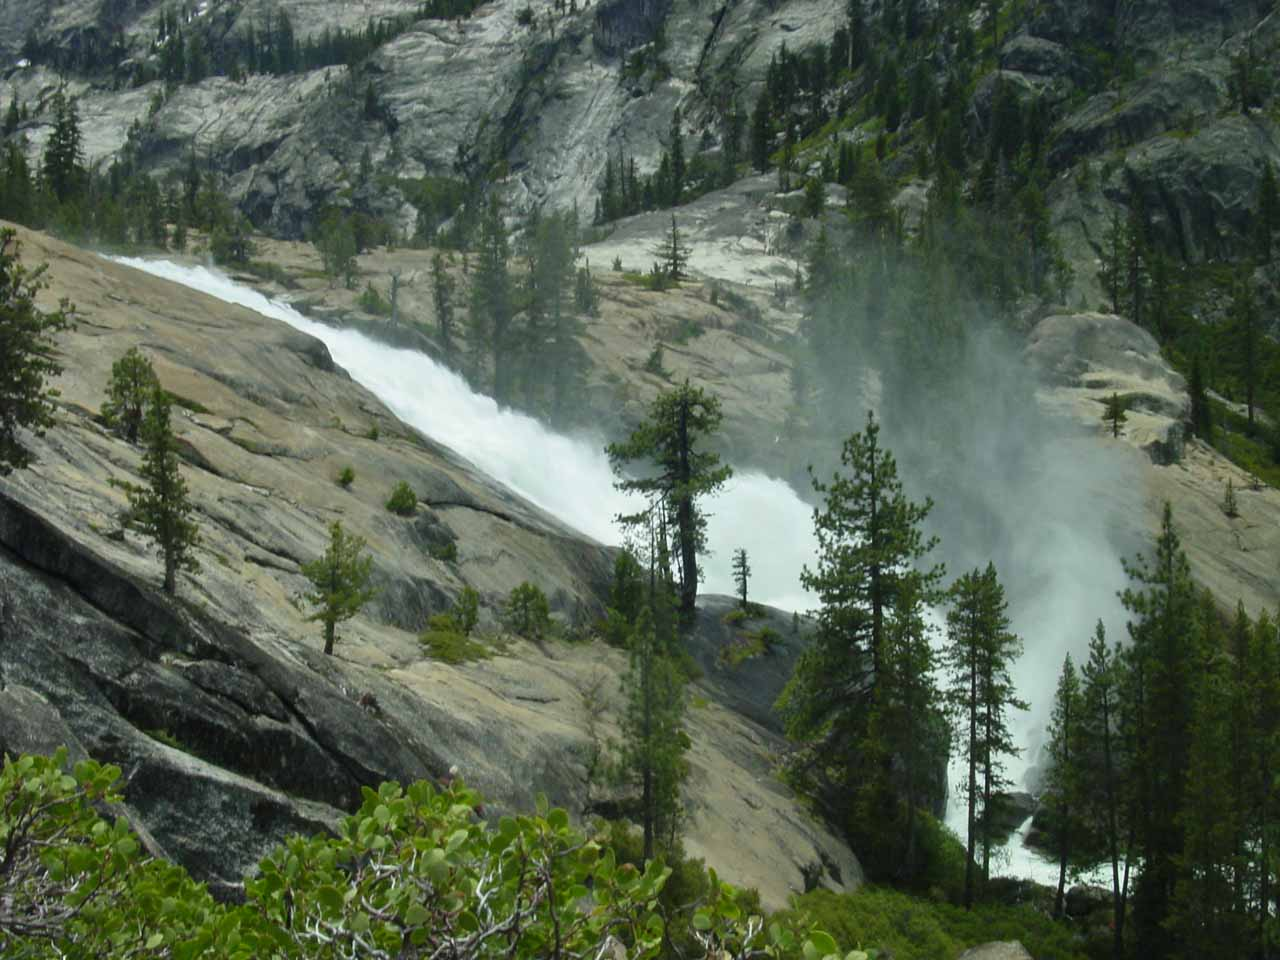 Profile view of Waterwheel Falls